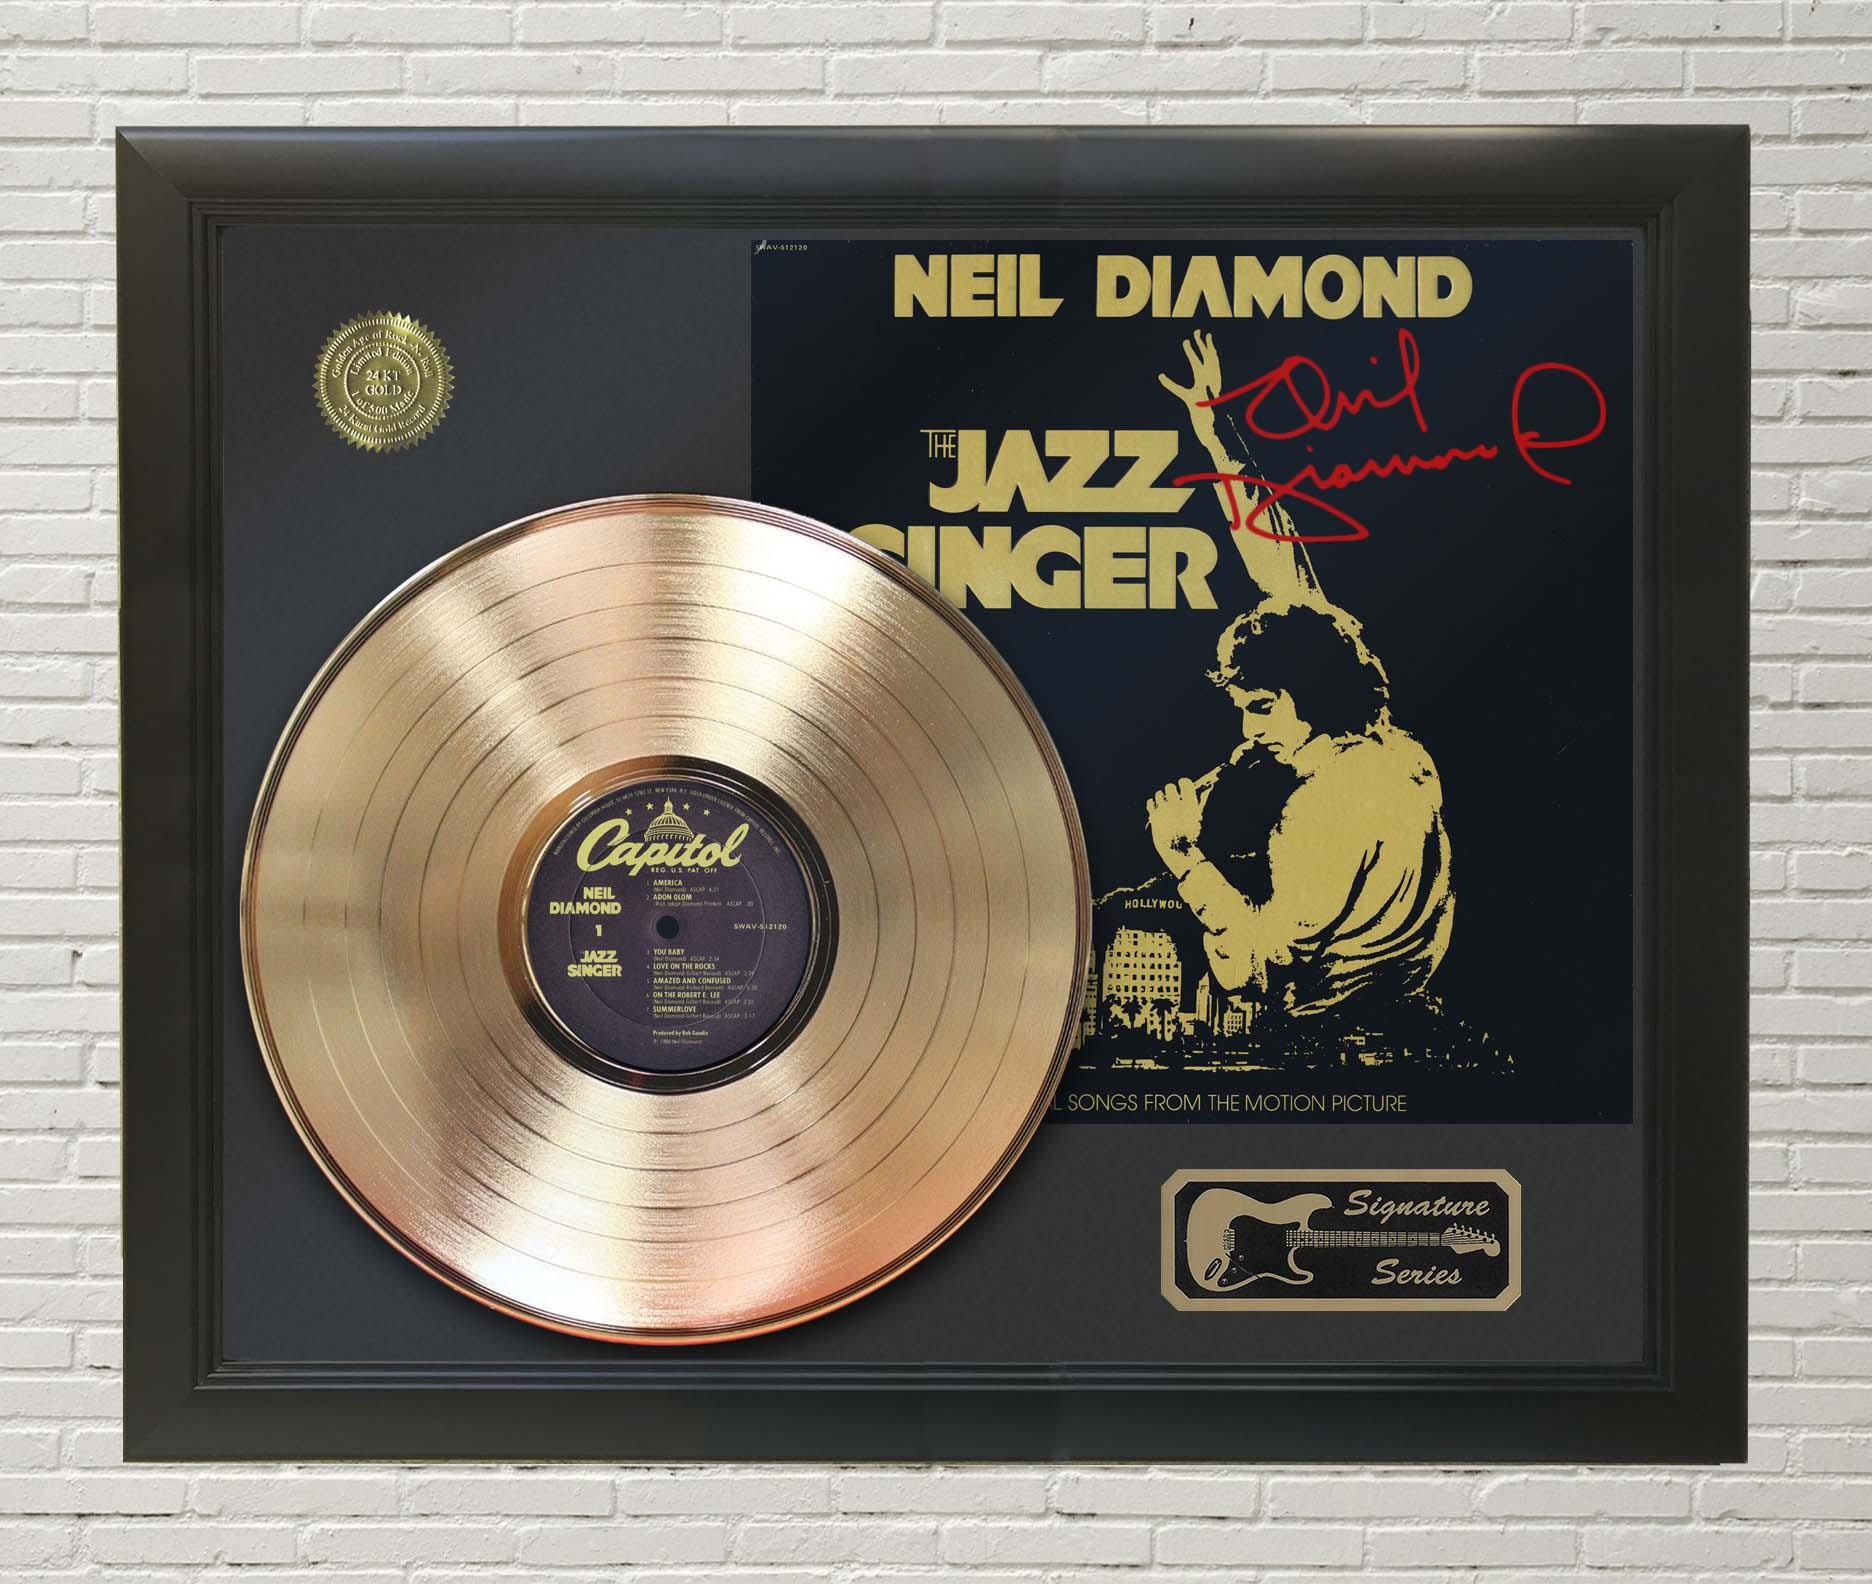 NEIL DIAMOND signed gold disc